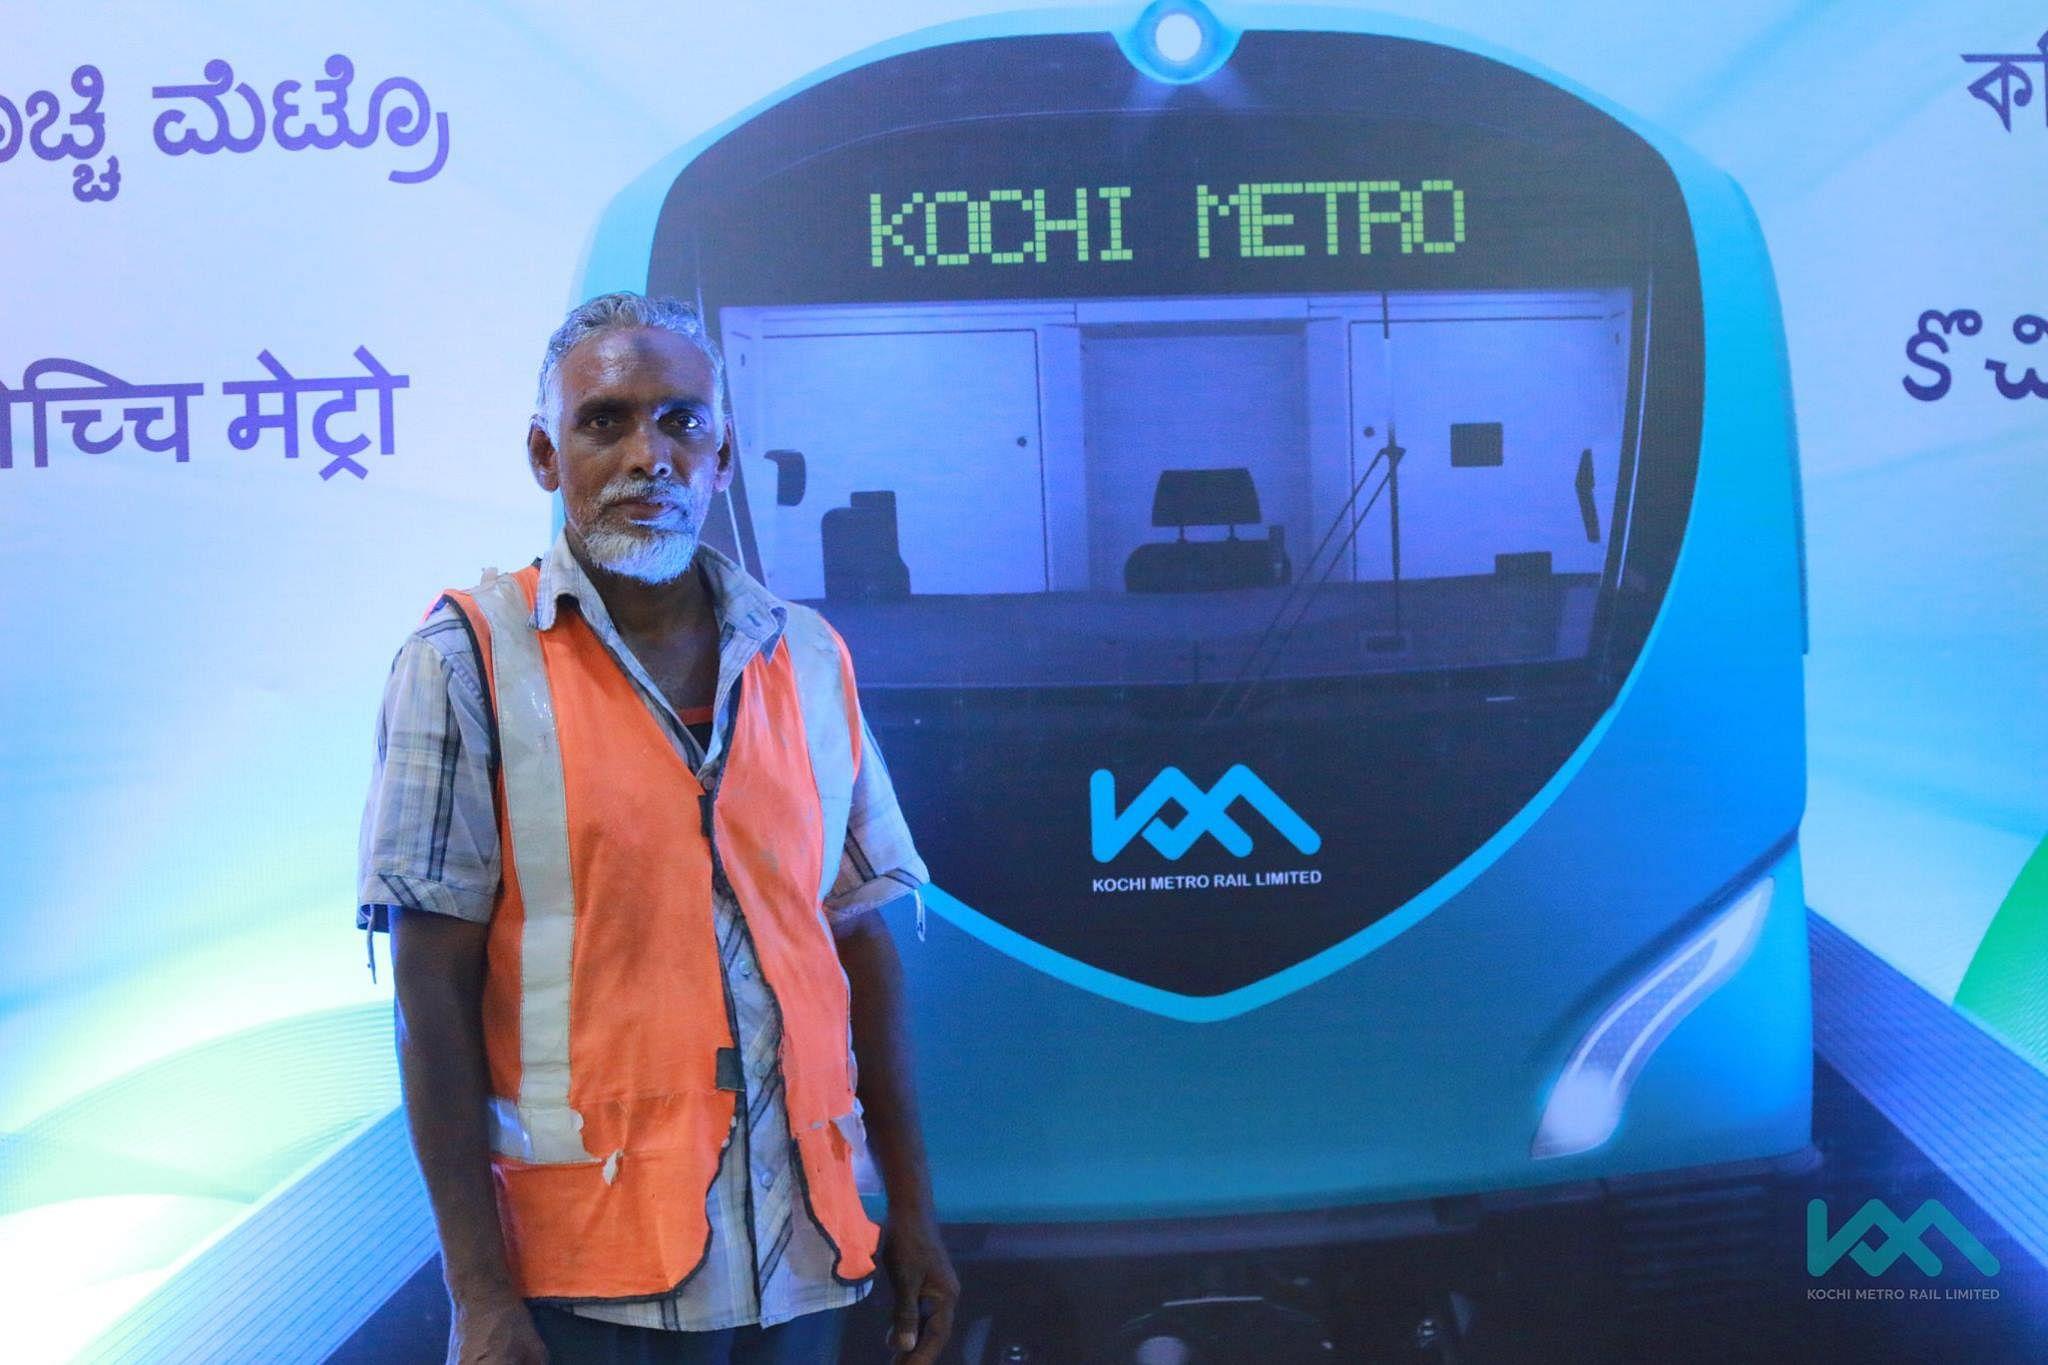 Kochi-metro-workers-sadhya-meal